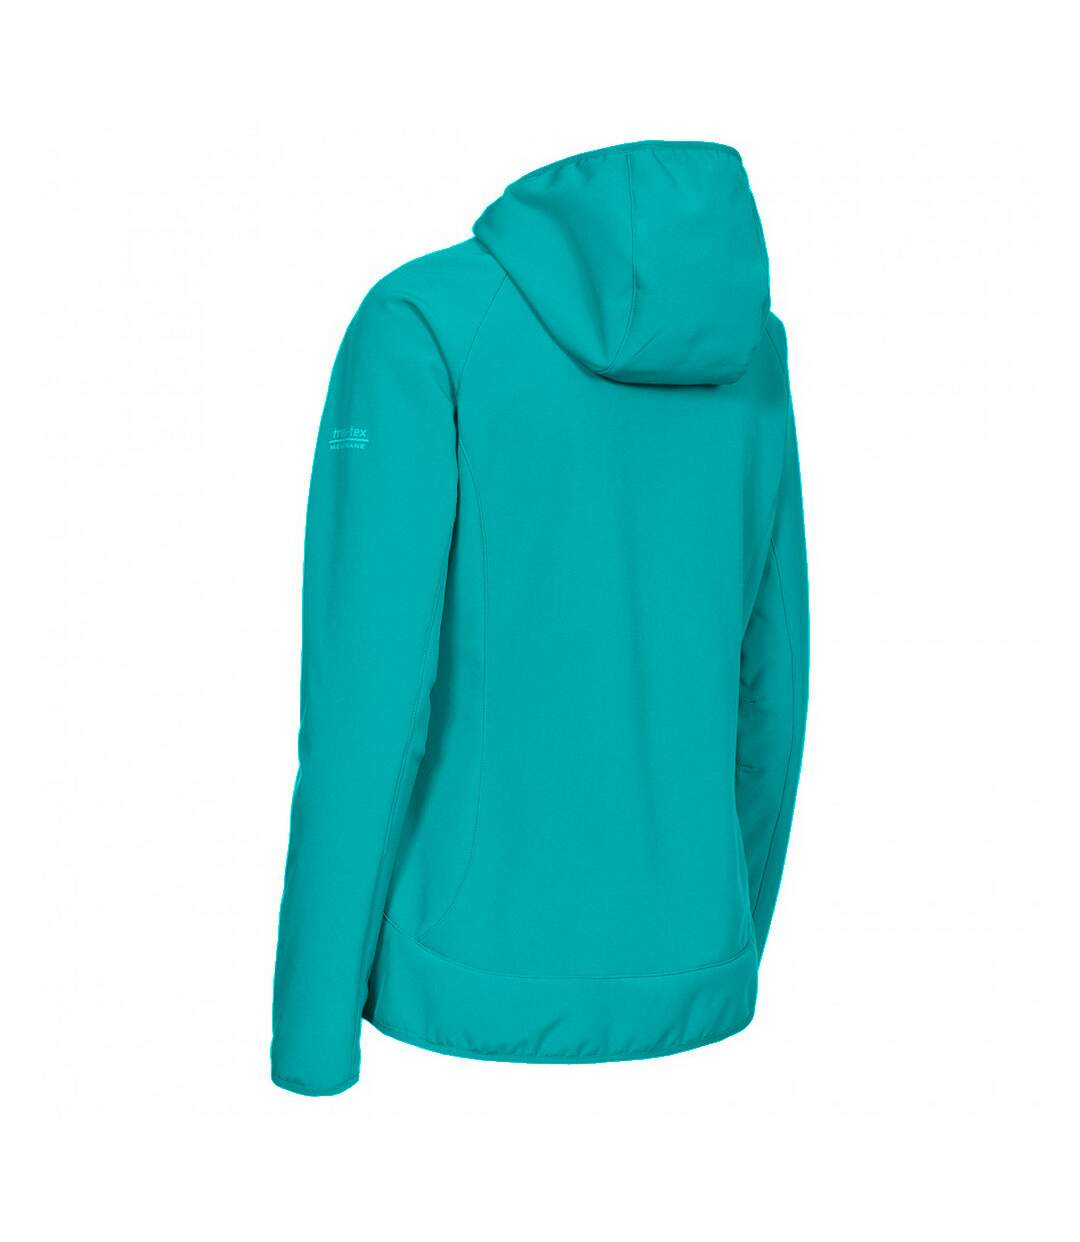 Trespass Womens/Ladies Imani Waterproof Softshell Jacket (Ocean Green) - UTTP1278